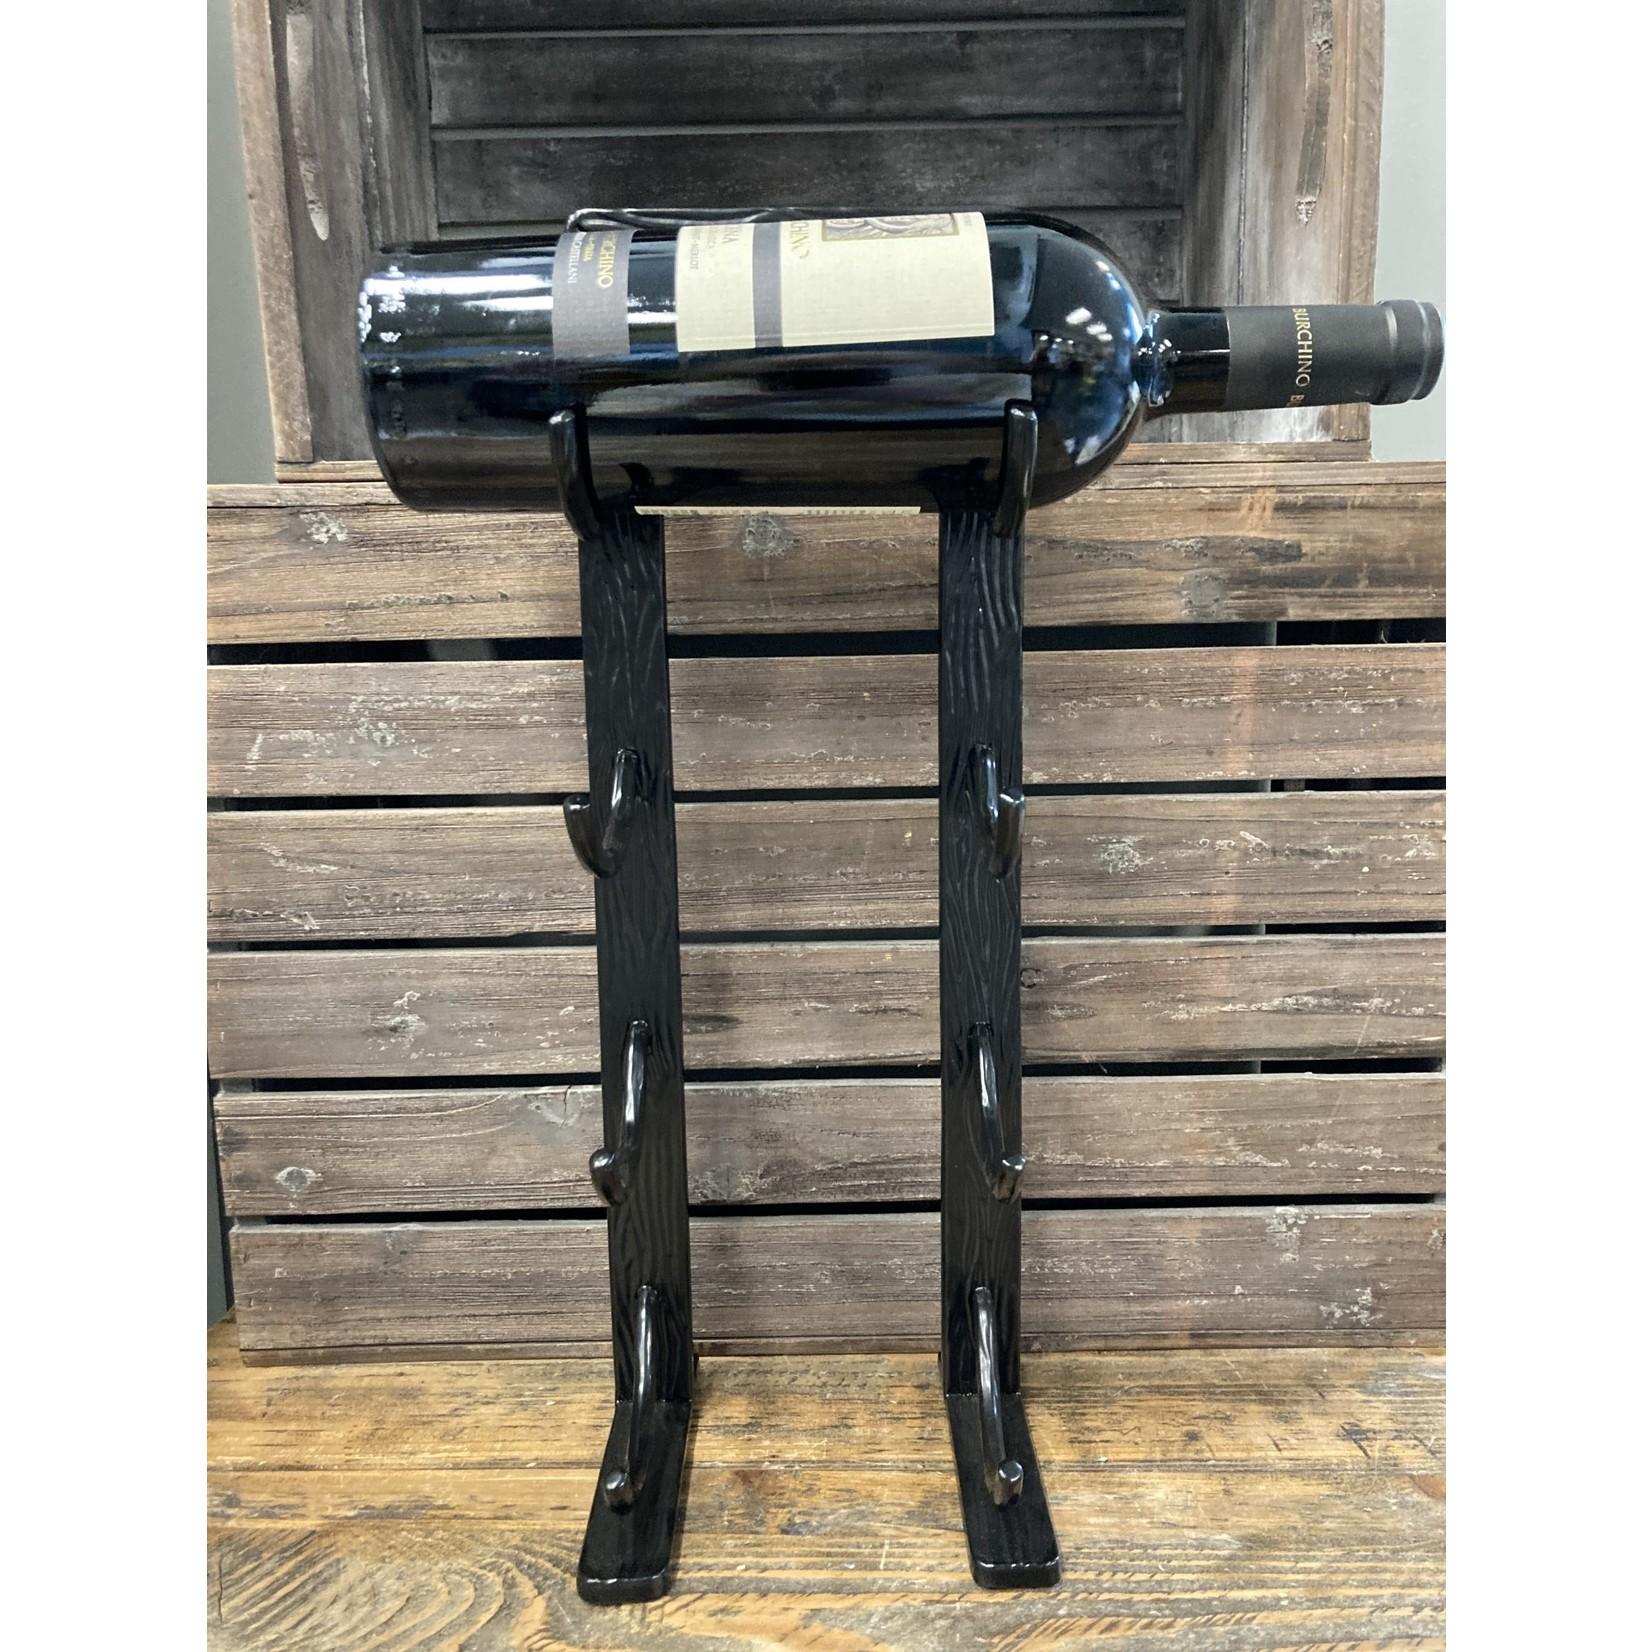 Herirage design Heritage l Wine rack black